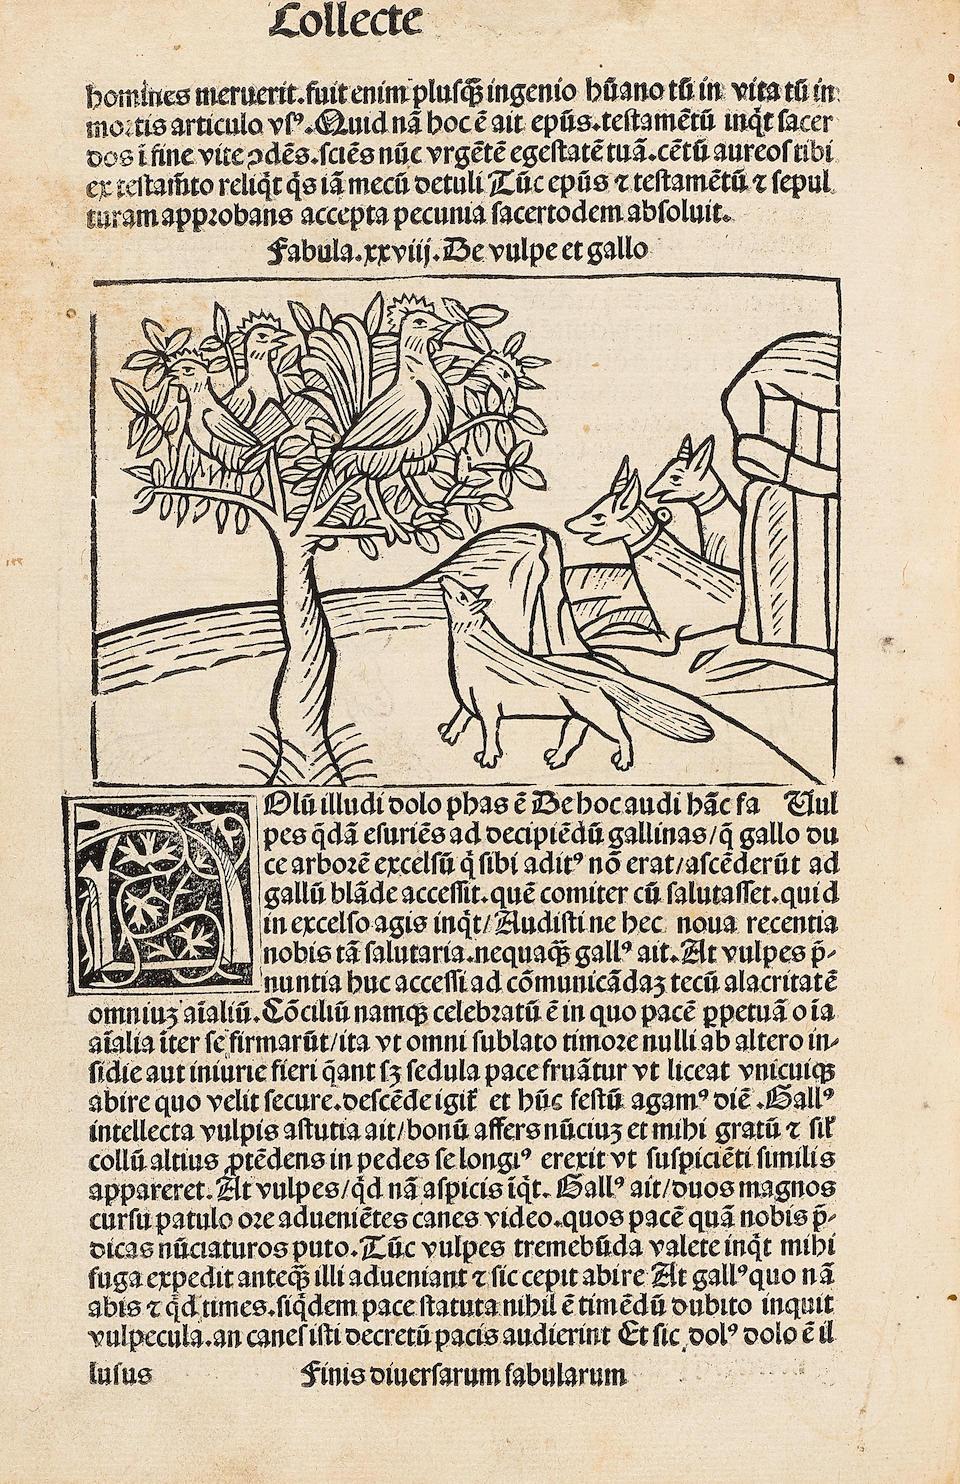 AESOP. c.620-560 B.C. [Vita et Fabulae], Latin prose version of Romulus, Franciscus Rinucius Aretinus, translator, et Fabulae, Lib. I-IV, with the metrical version of Anonymous Neveletti (i.e., Aesopus Moralisatus).  [Basel: Jacob Wolff von Pforzheim,  c.1489.]